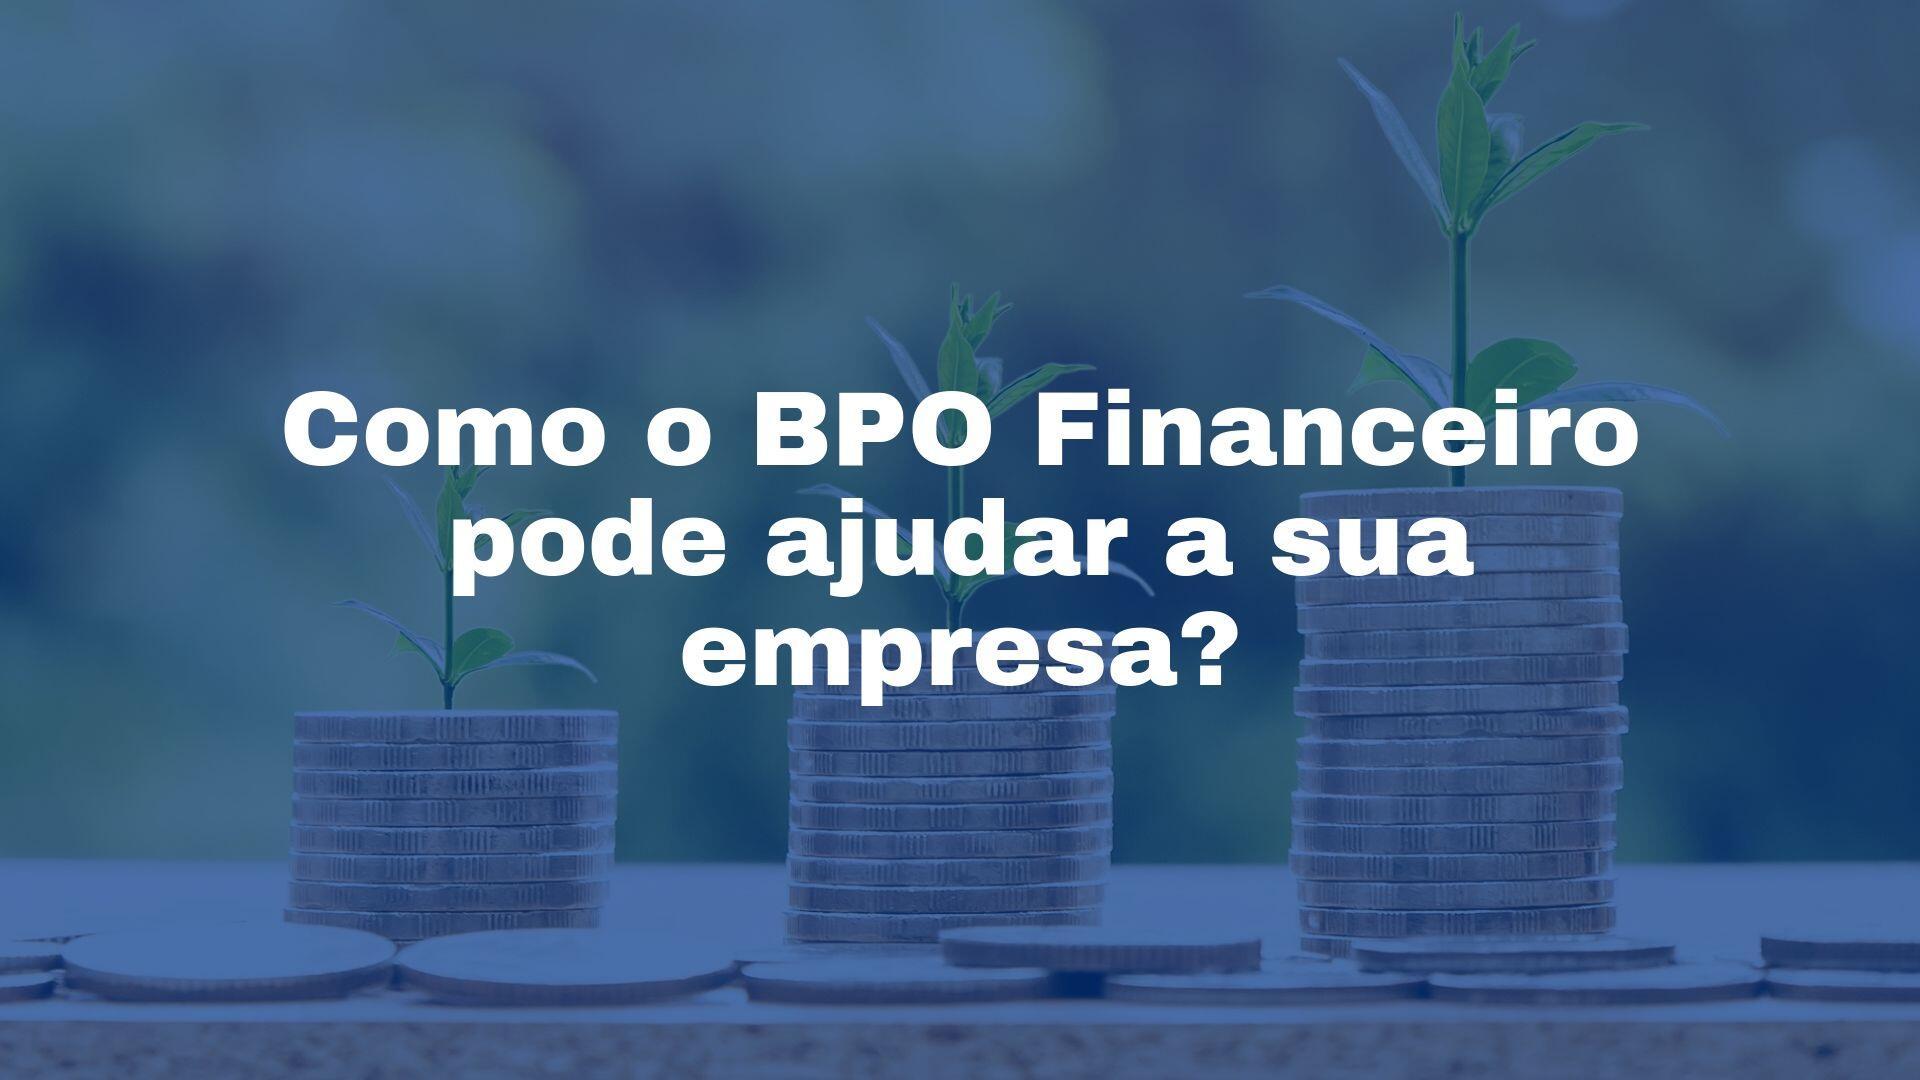 BPO Financeiro pode ajudar empresa